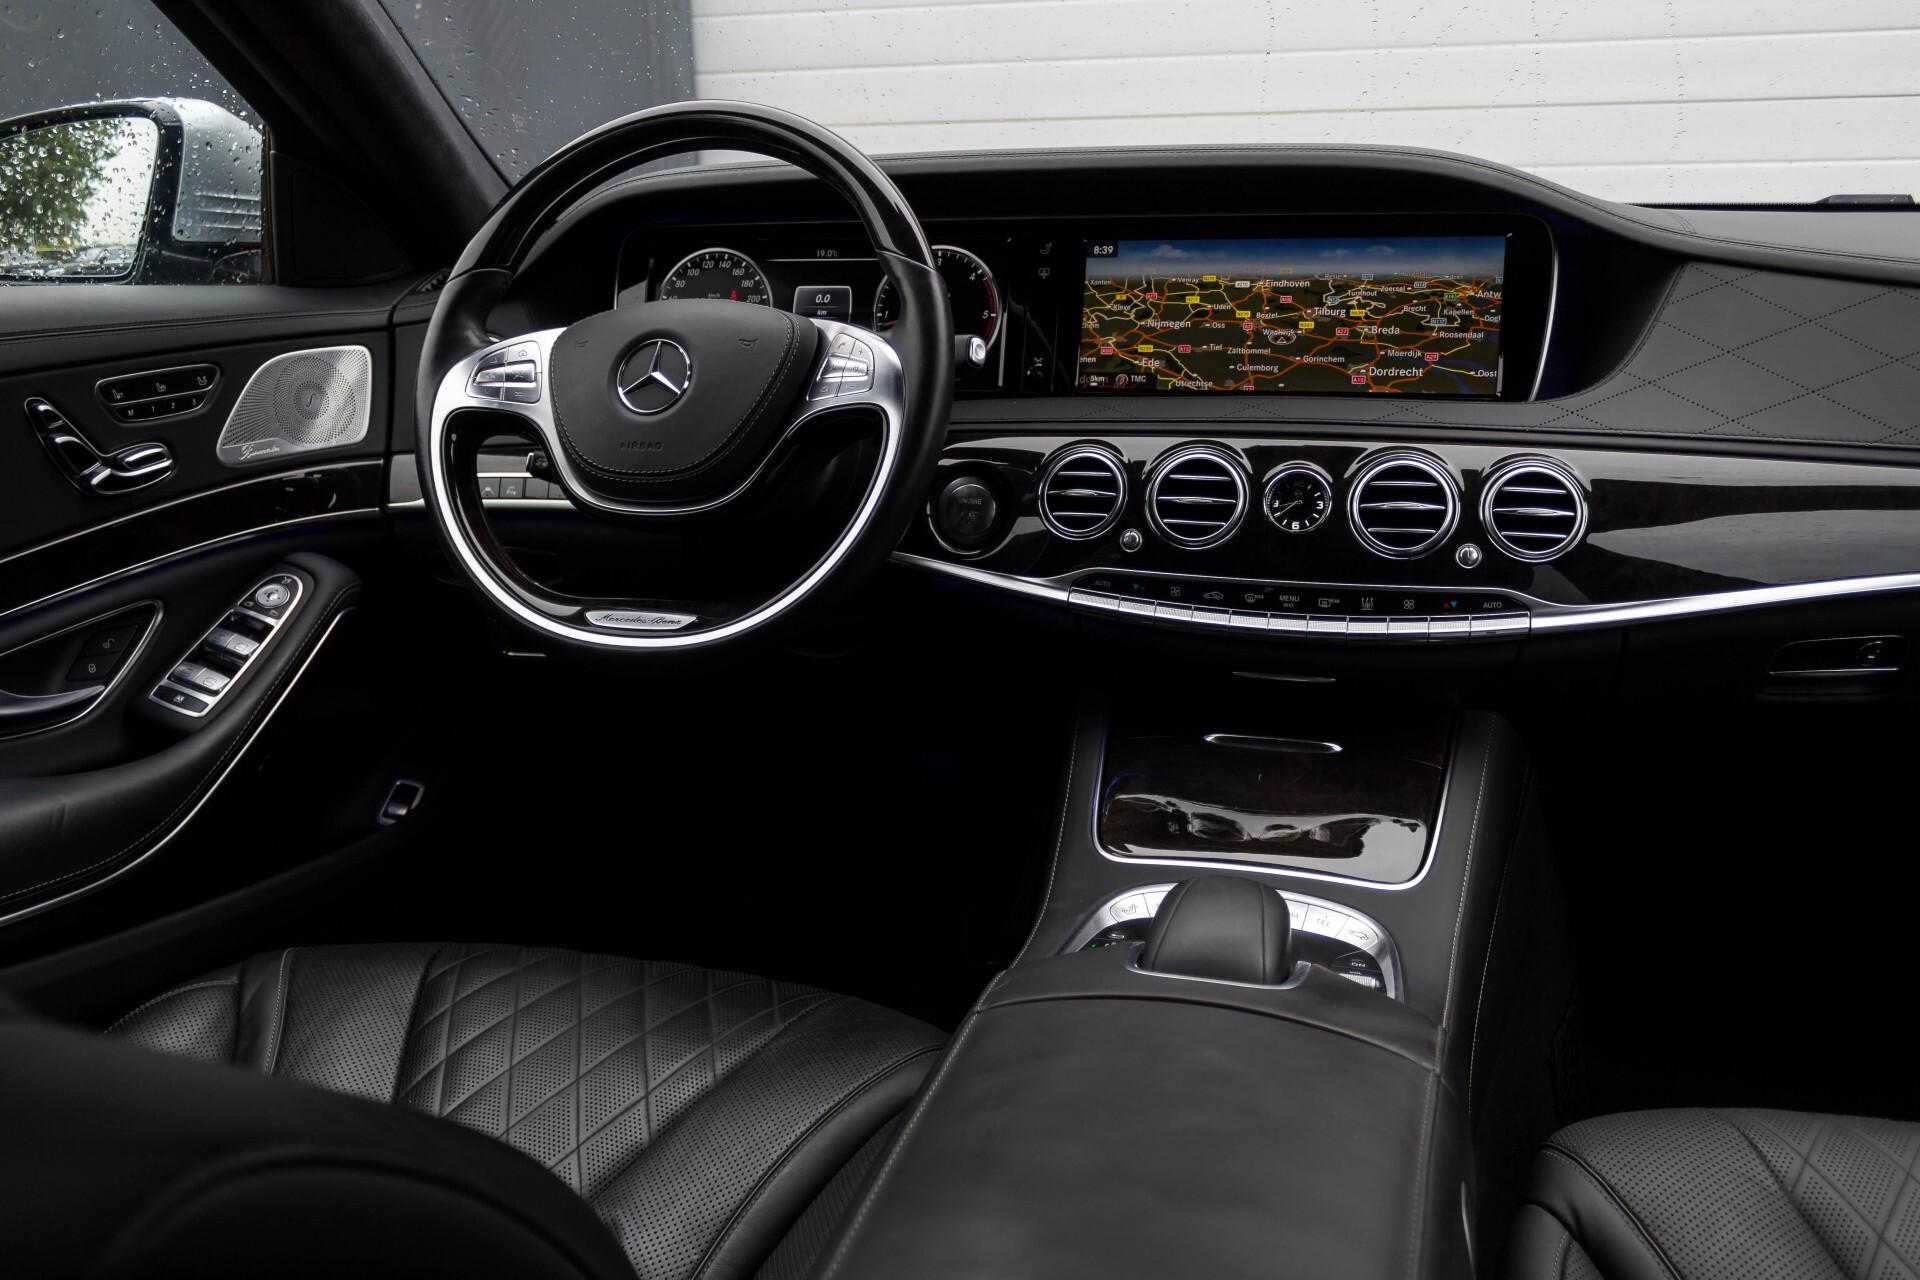 Mercedes-Benz S-Klasse 350 Bluetec Exclusive Panorama/Massage/Keyless/Distronic/Standkachel Aut7 Foto 6